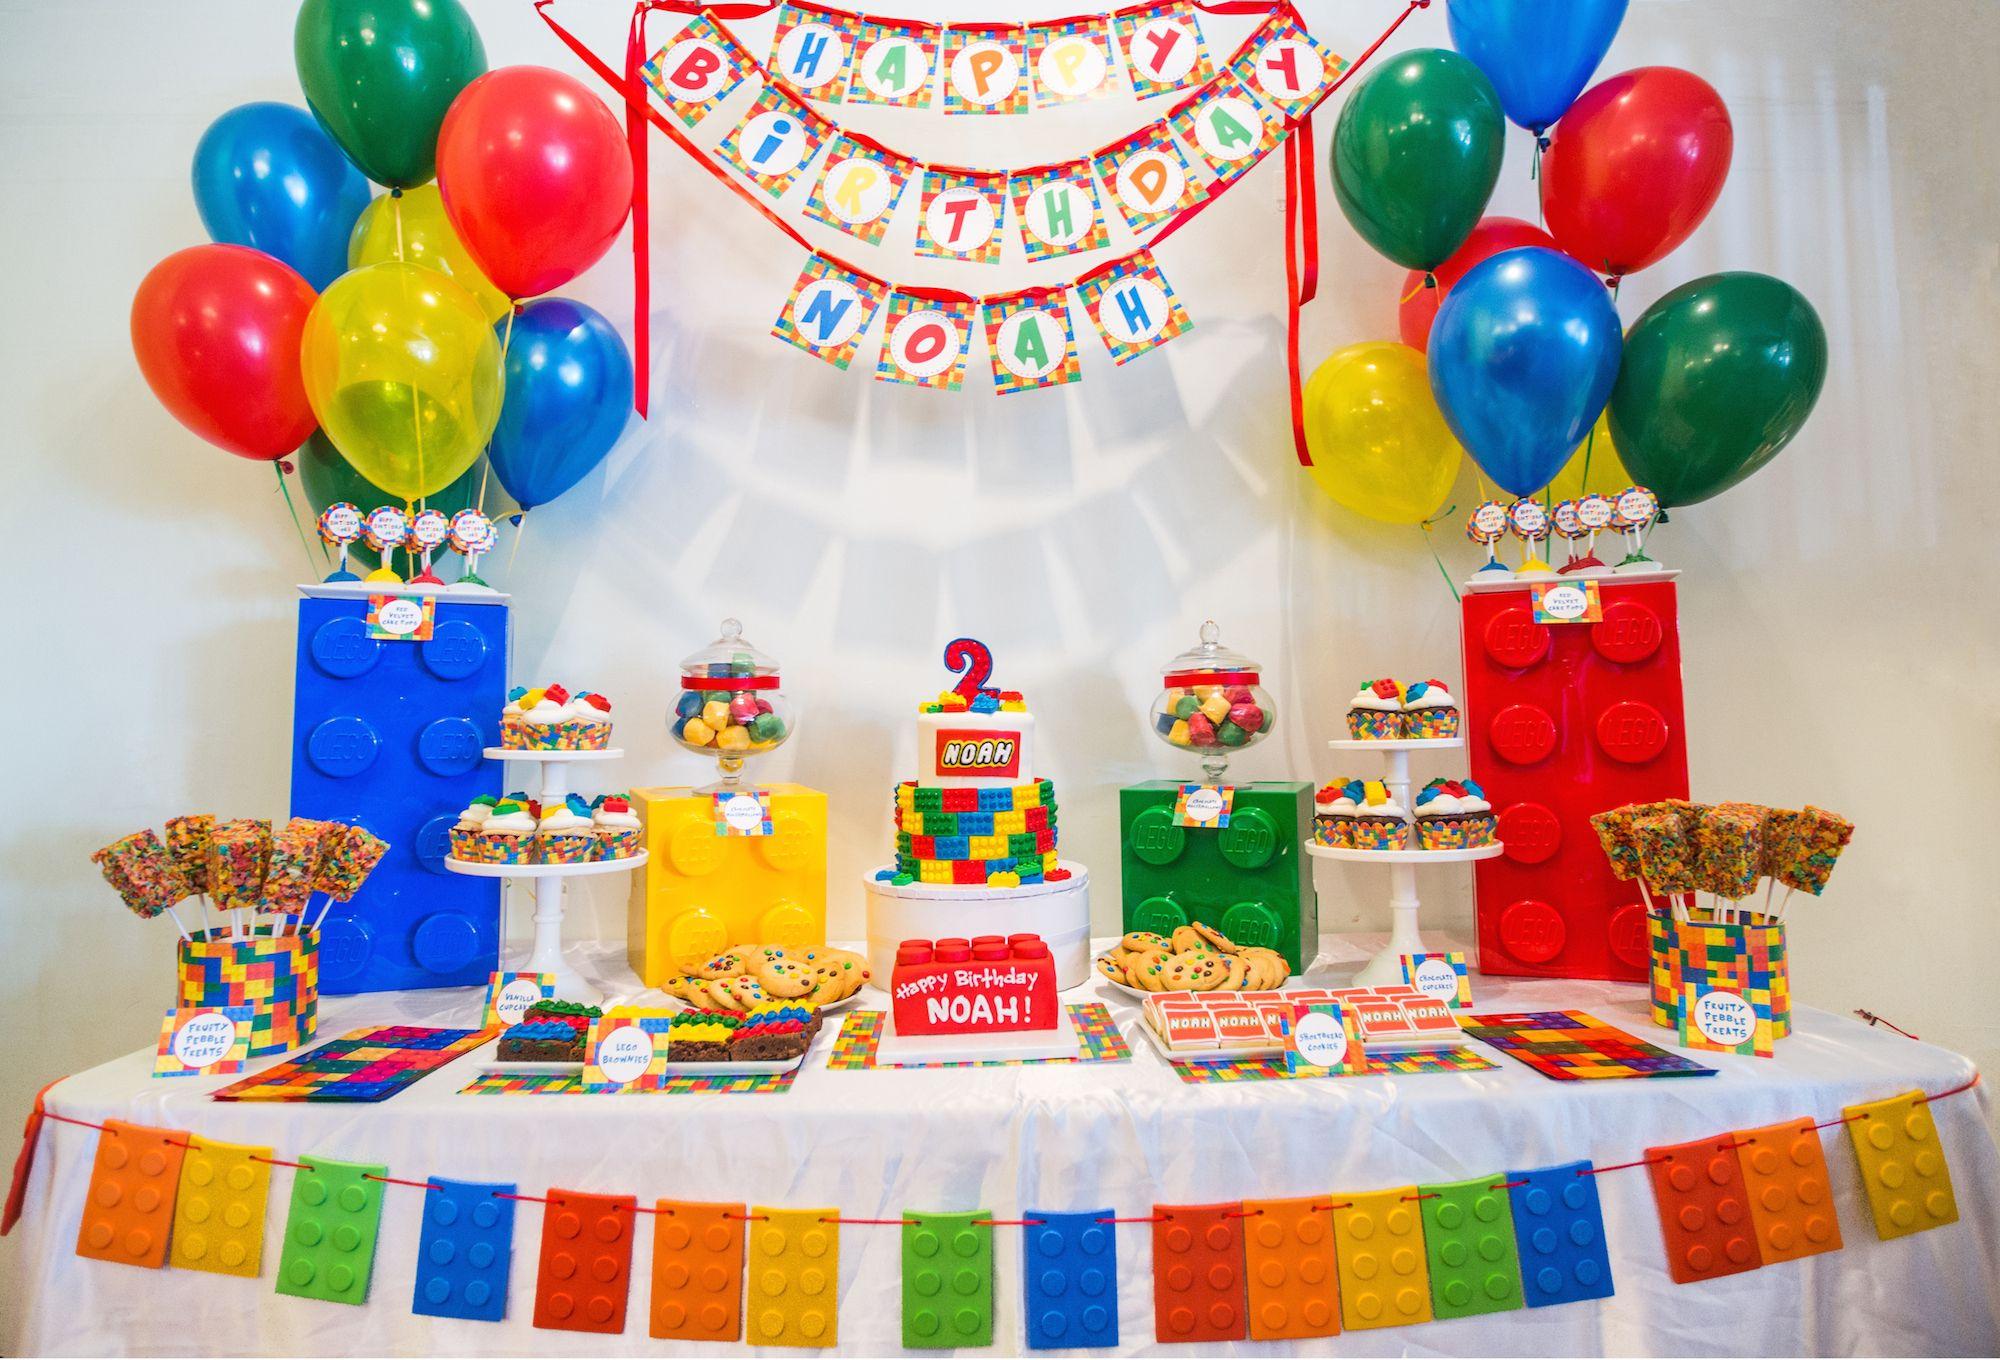 Lego Themed Birthday Dessert Table Sweetesbakeshop Desserttable Legothemedbirthday